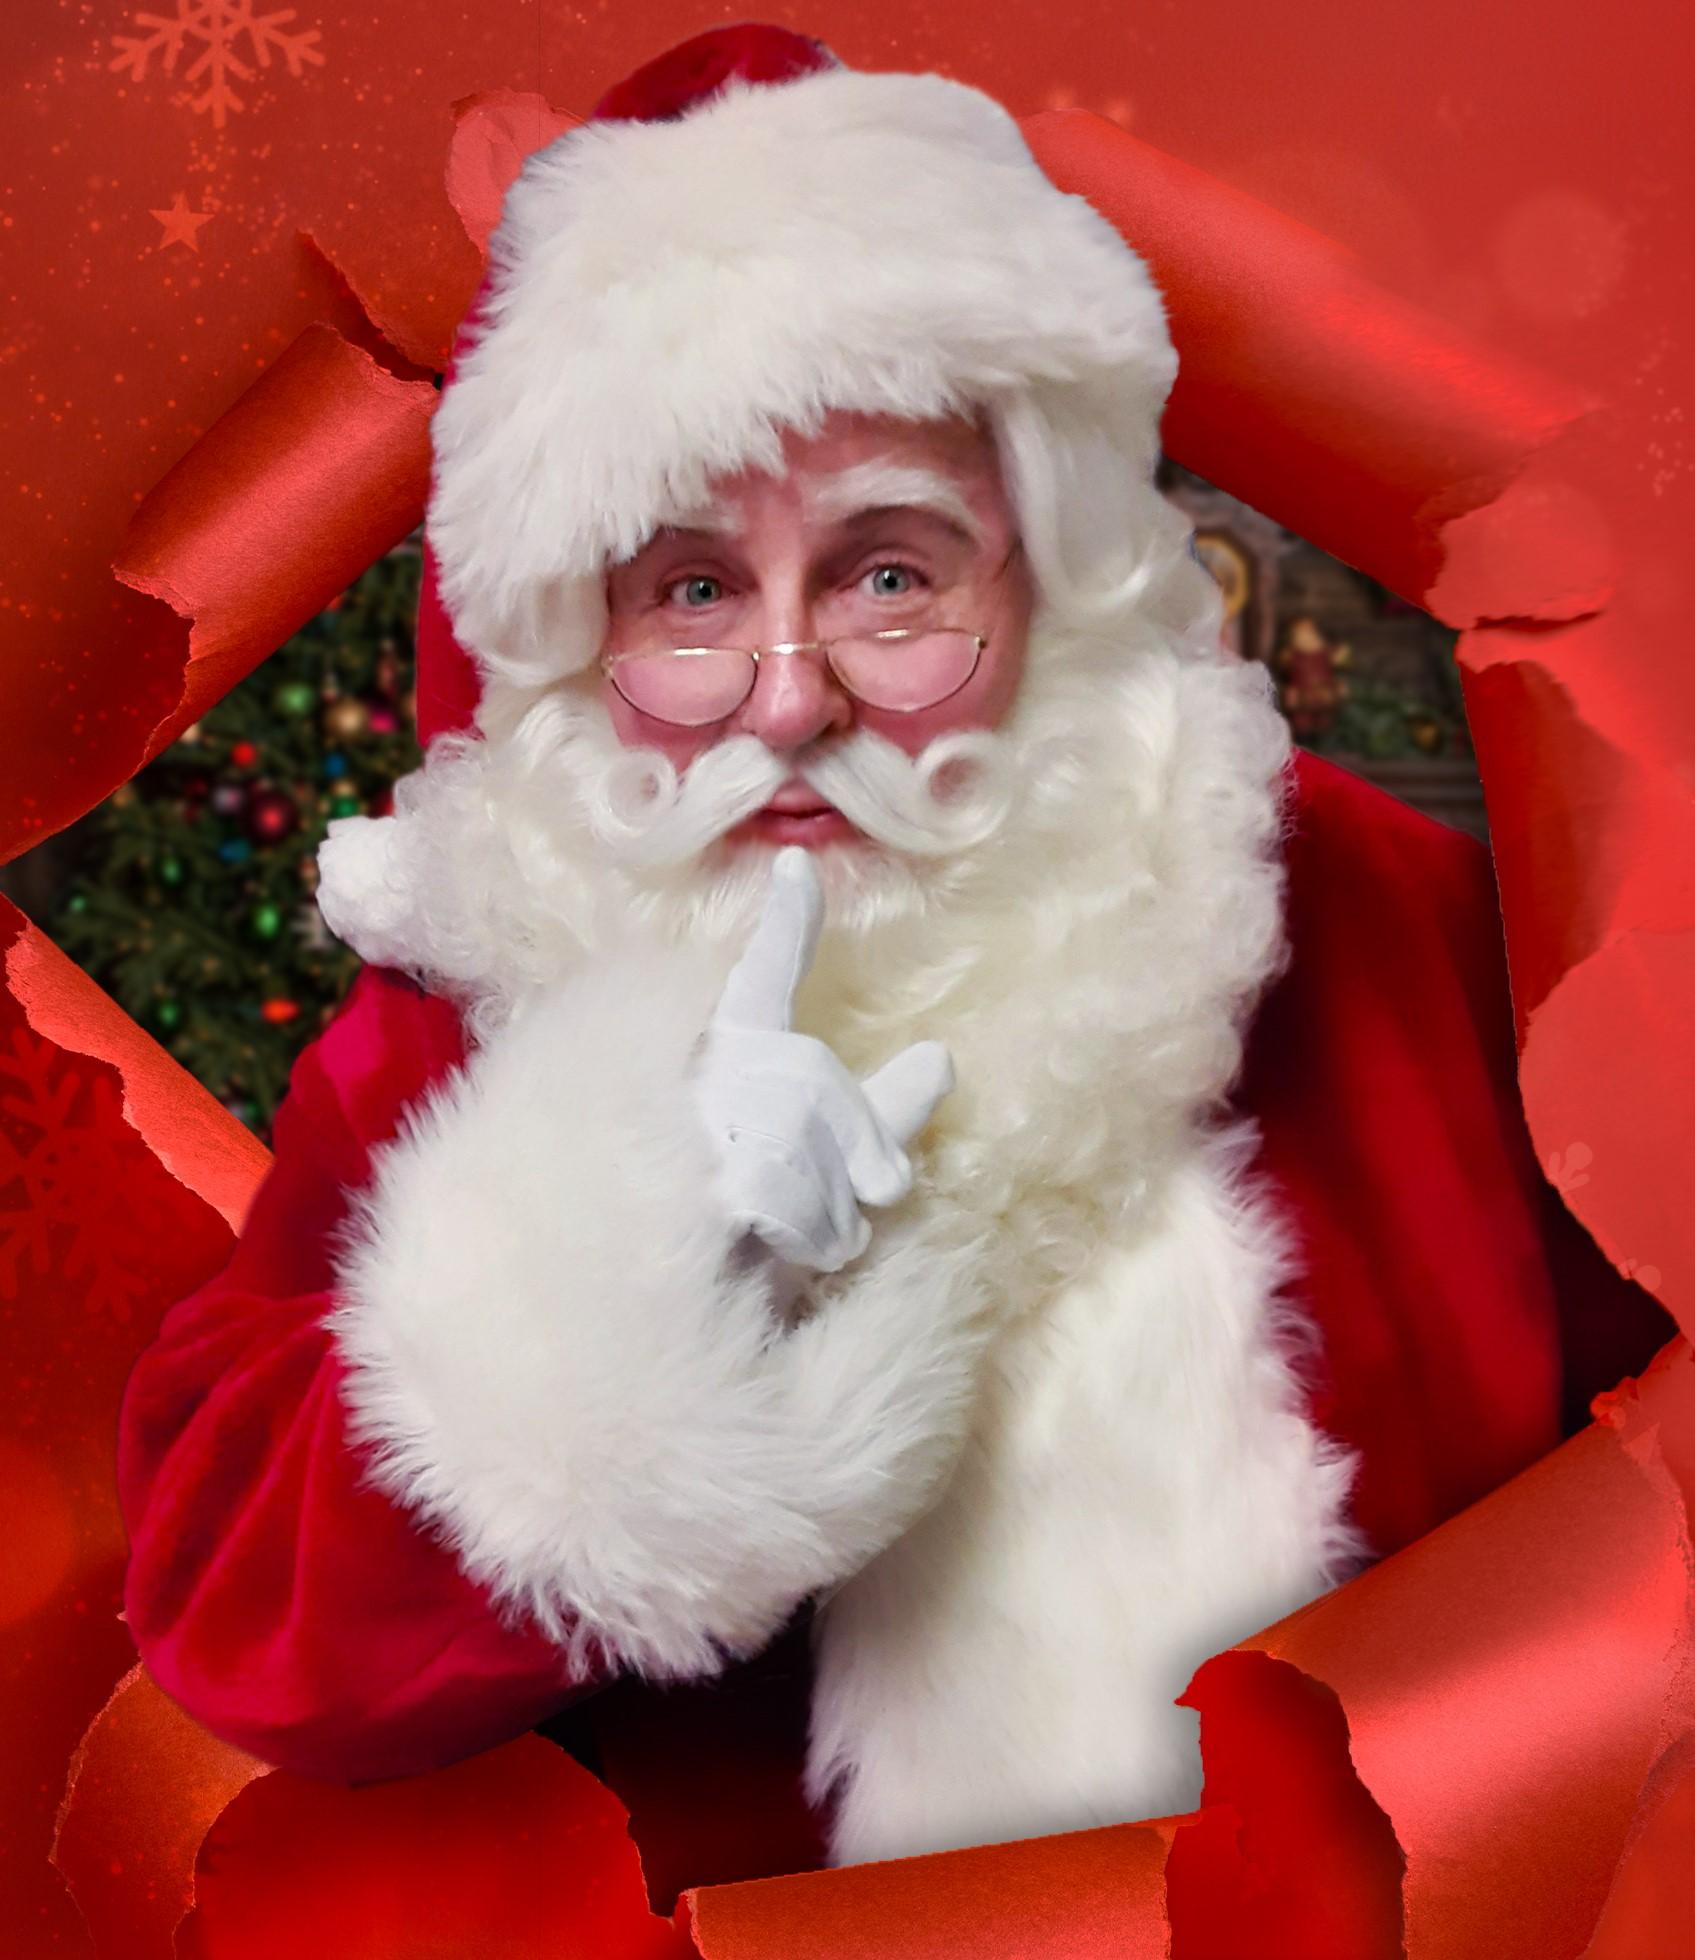 Actor Michael Walters as Santa Claus